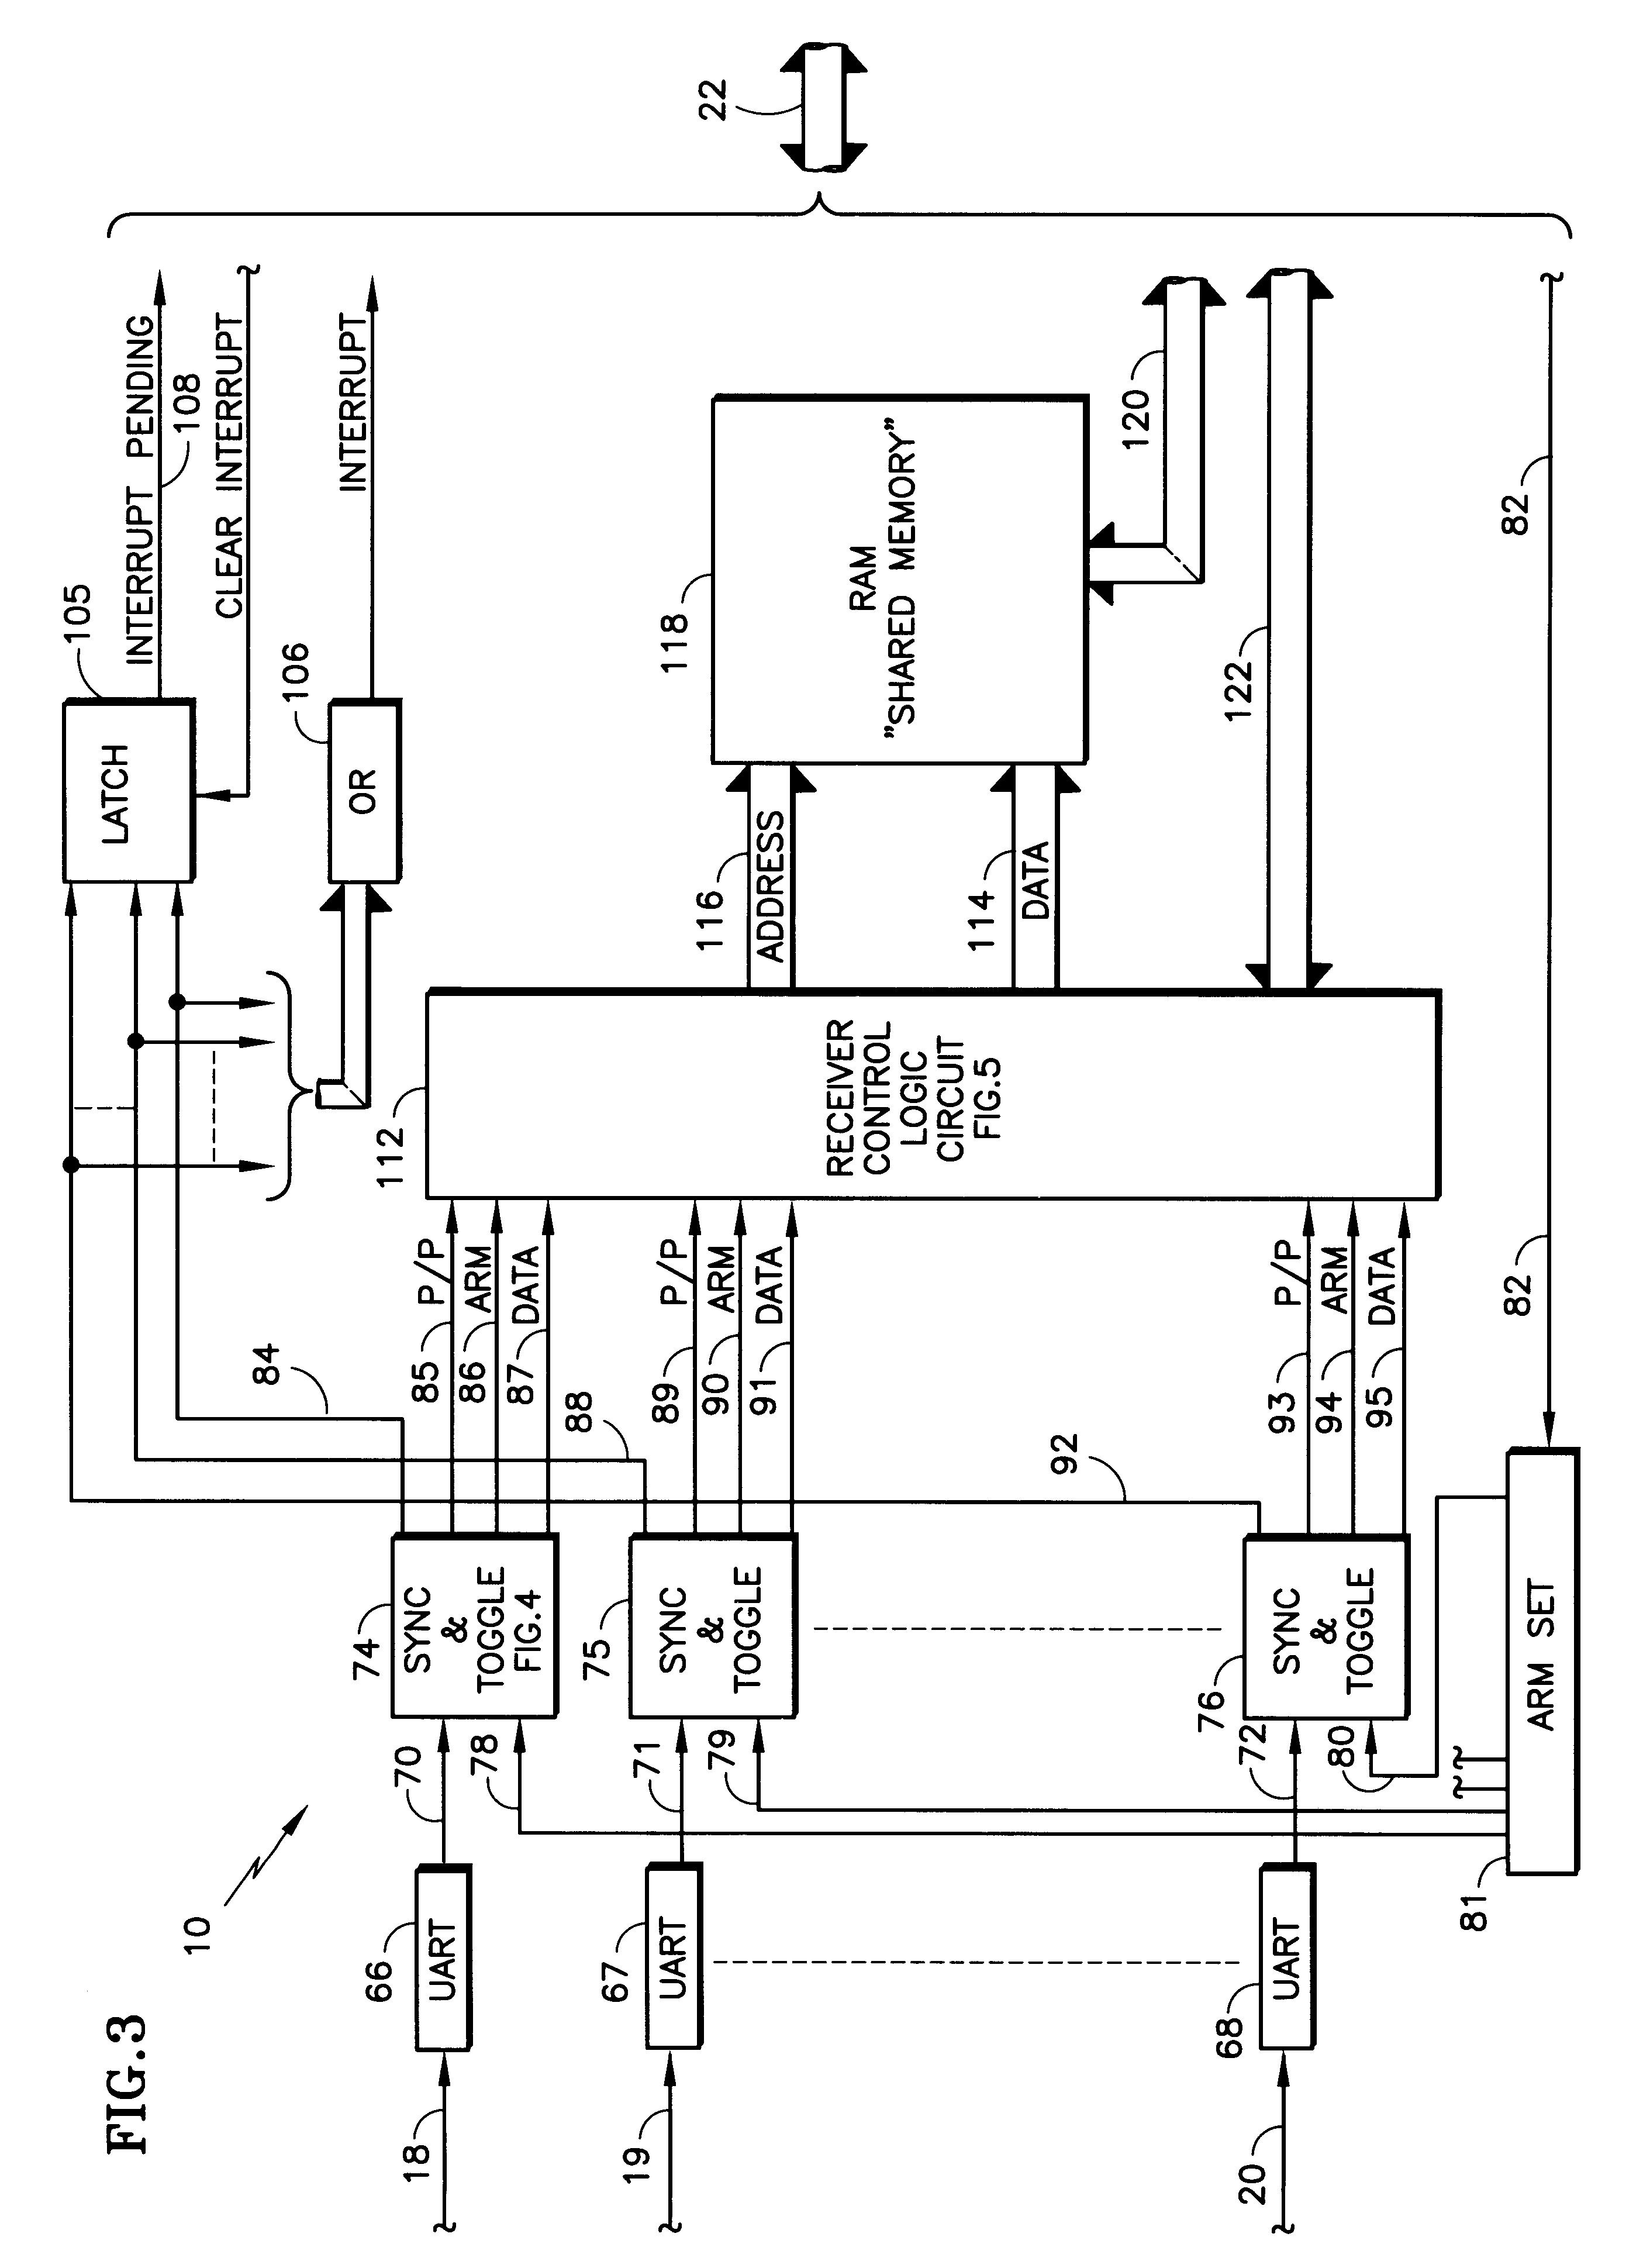 Siniconplasticsinc additionally Cirtecmedicalsystems moreover US6360290 as well US4933836 furthermore Lancaster. on united technologies corporation address